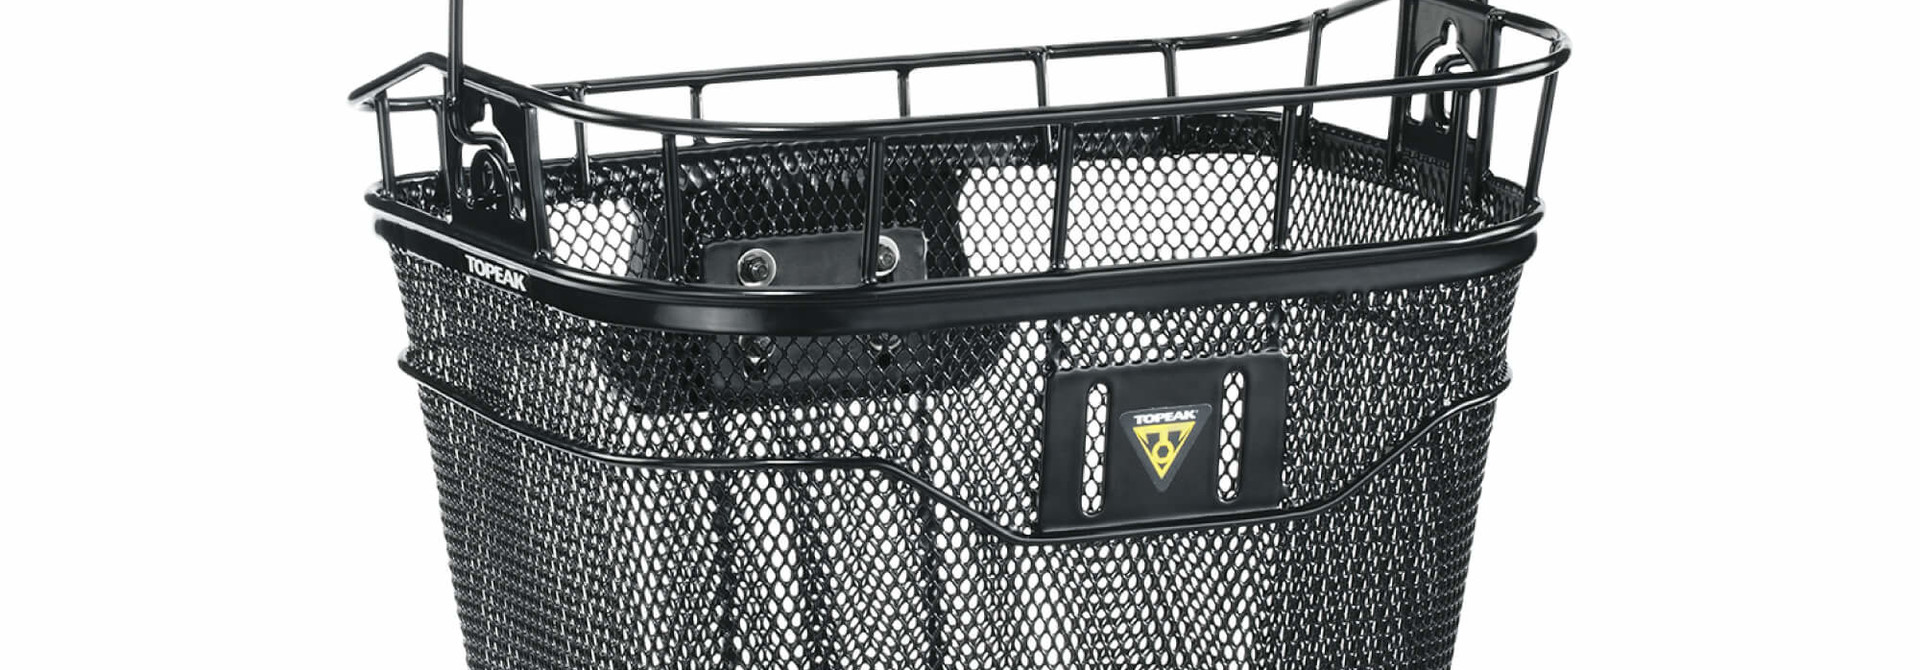 Front Basket Black Fixer 3